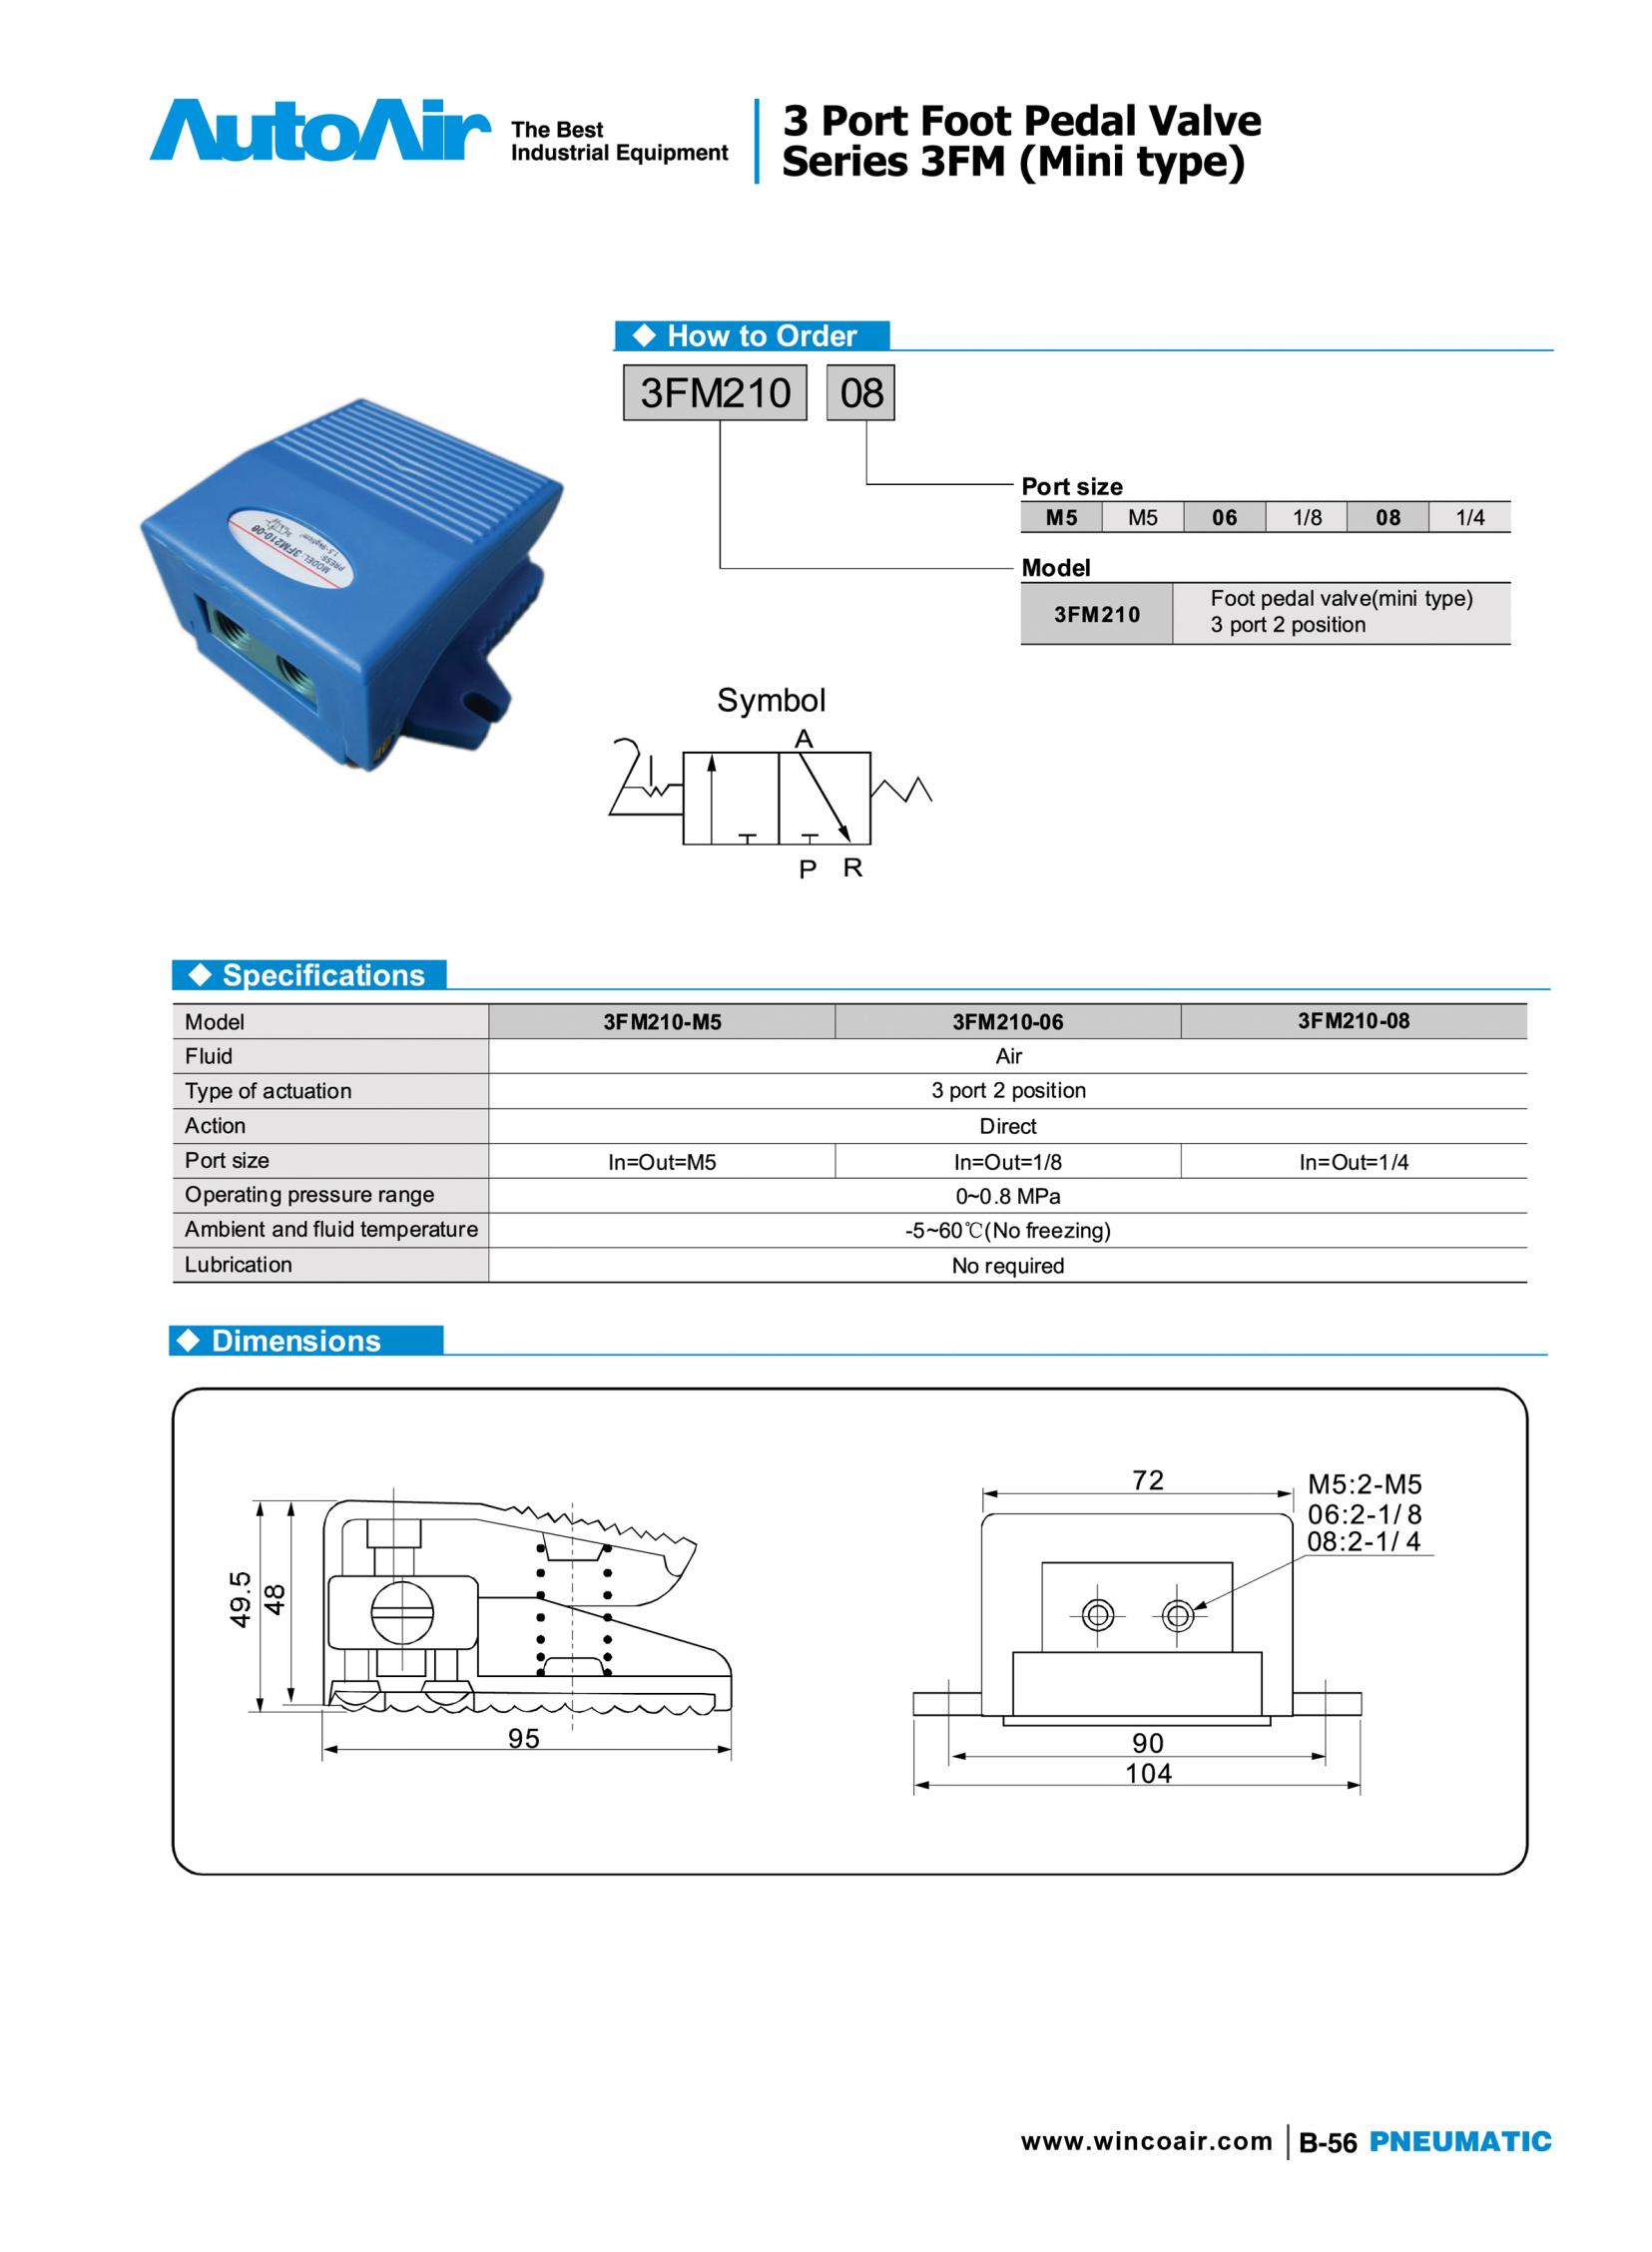 Solenoid valve(56)(1)